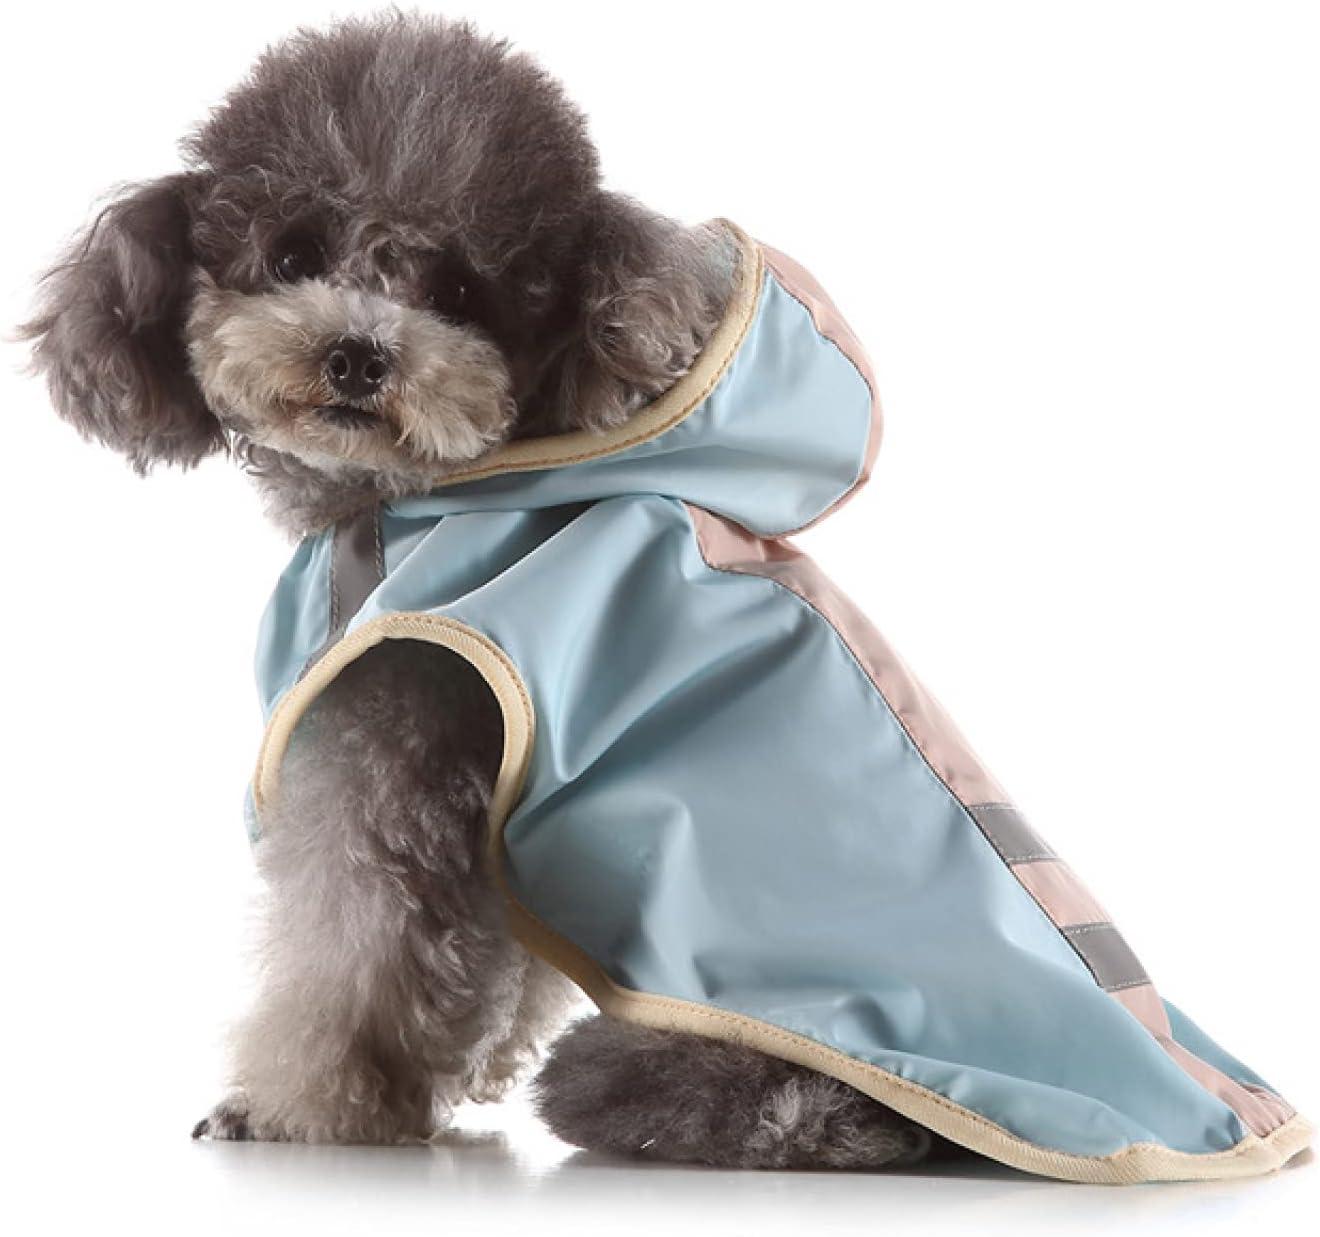 DYHJ Impermeable para Perros, Impermeable para Mascotas, Chaqueta Impermeable para Mascotas con Capucha para Lluvia Ligera y Transpirable, para Cachorros Perros Pequeños Medianos,Blue-S